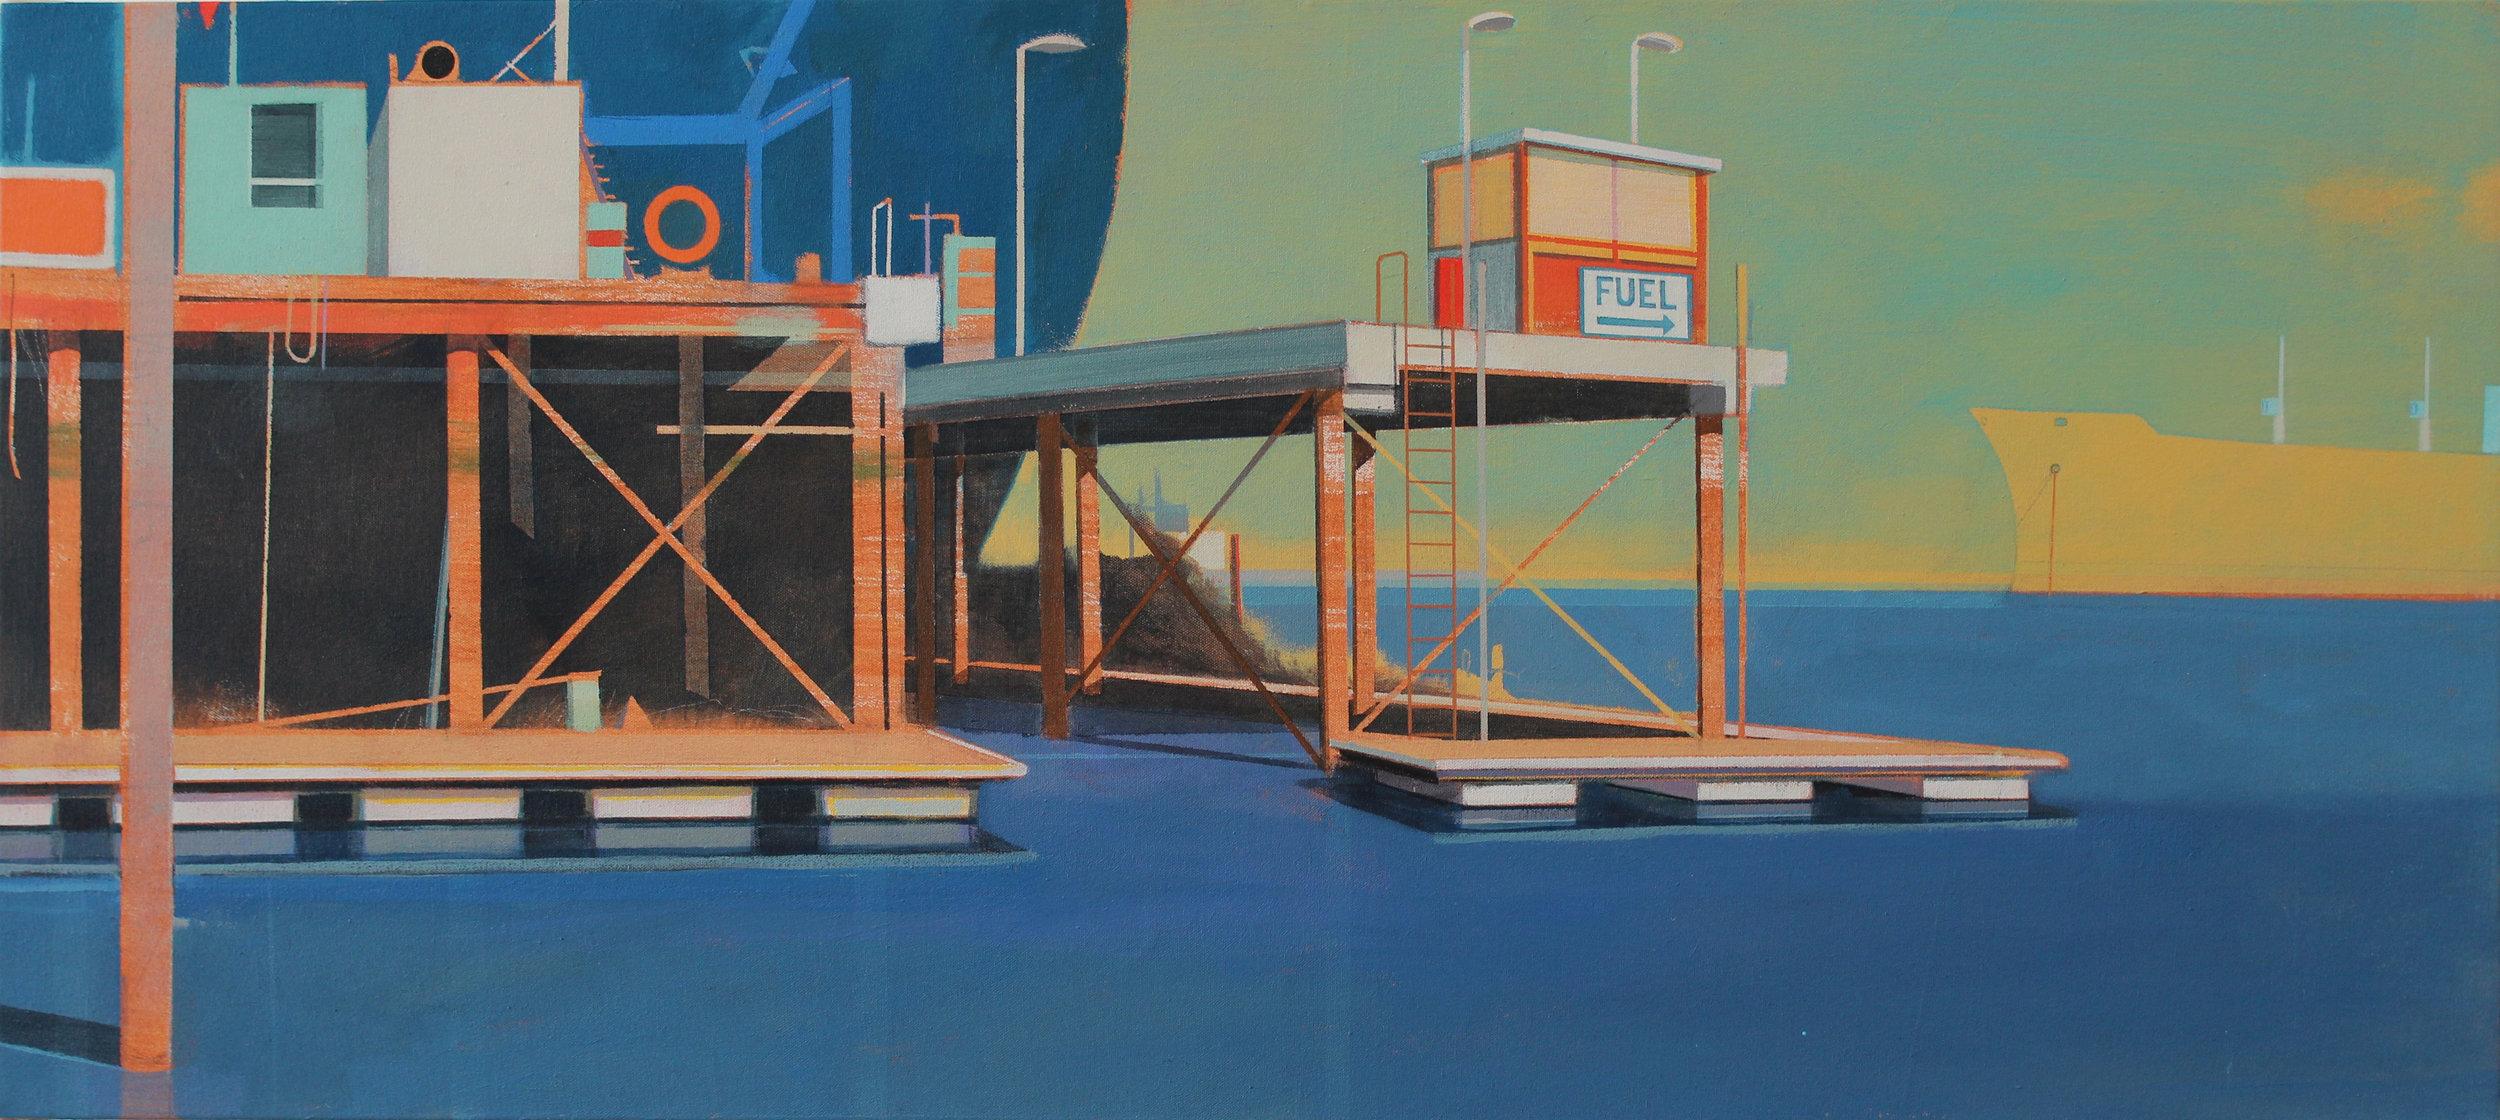 Shipyard and pontoons